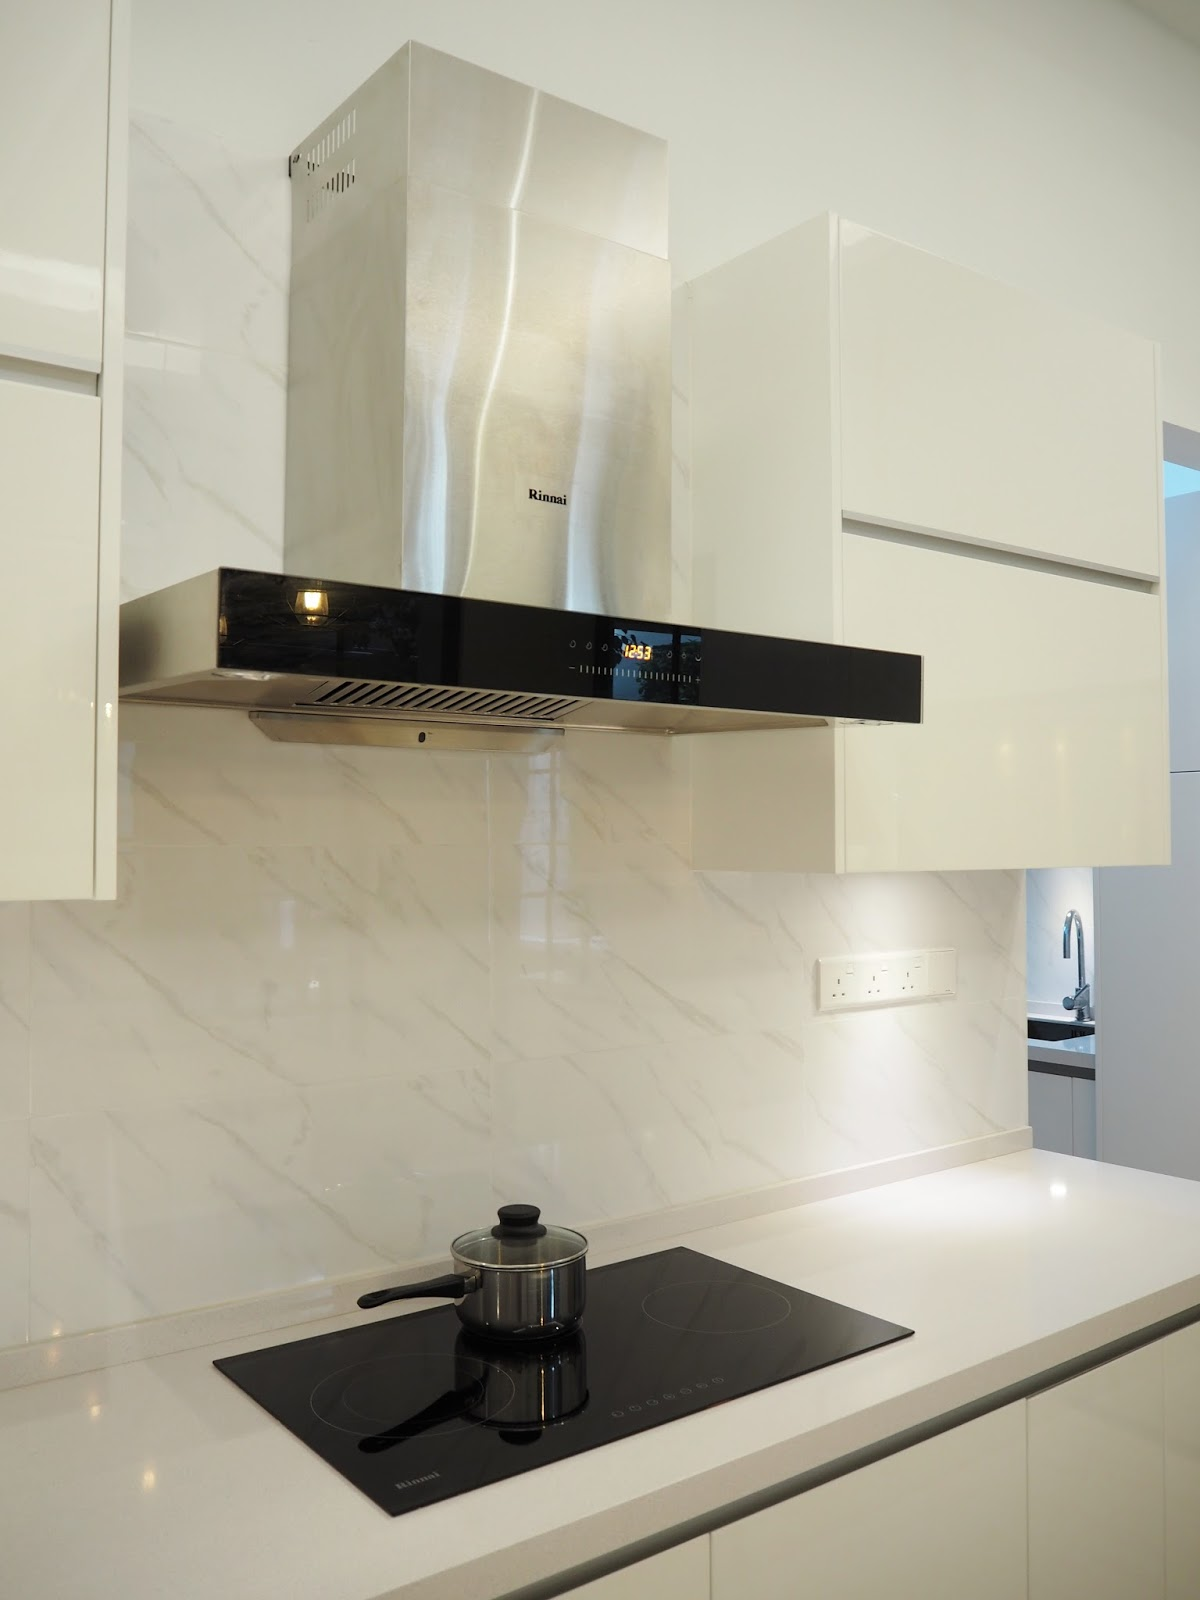 Rinnai Hob Kitchen ~ Meridian interior design and kitchen in kuala